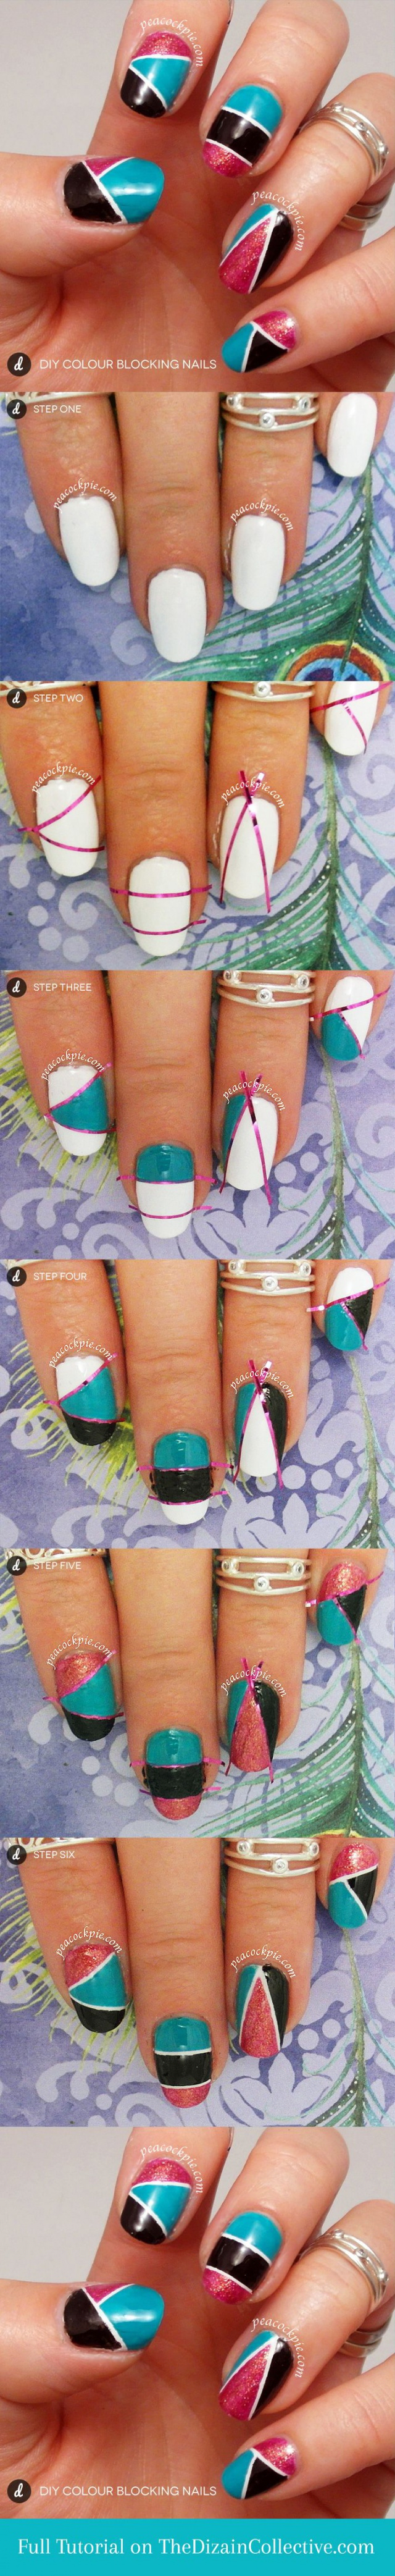 дизайн ногтей скотч лента пошаговое Nail Design Scotch tape